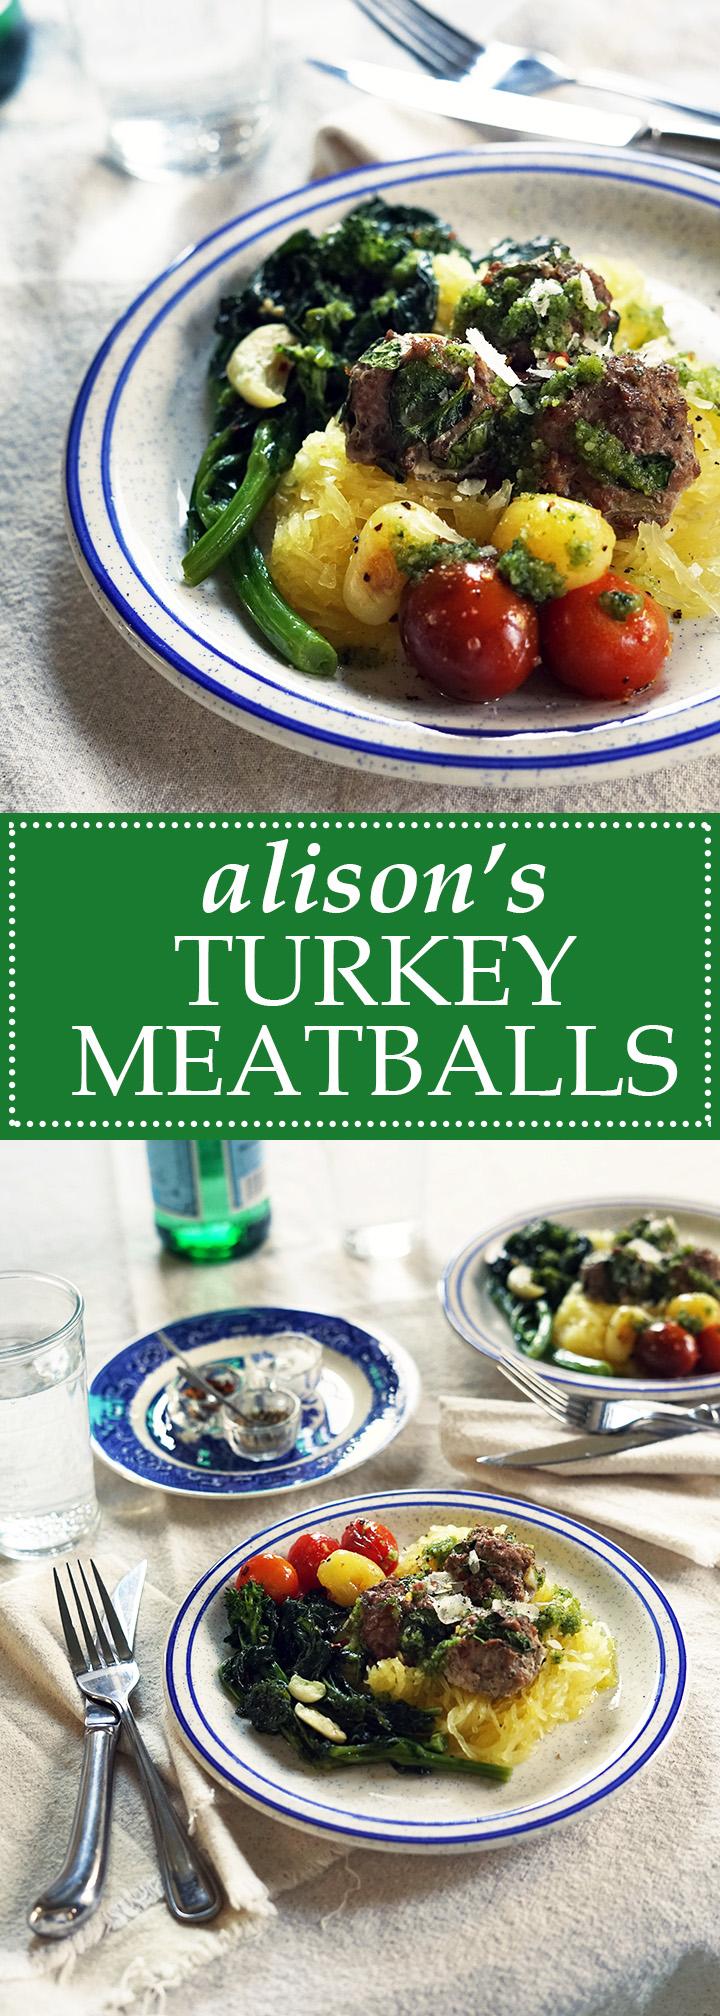 Alison's Turkey Meatballs | www.thetableofcontents.co